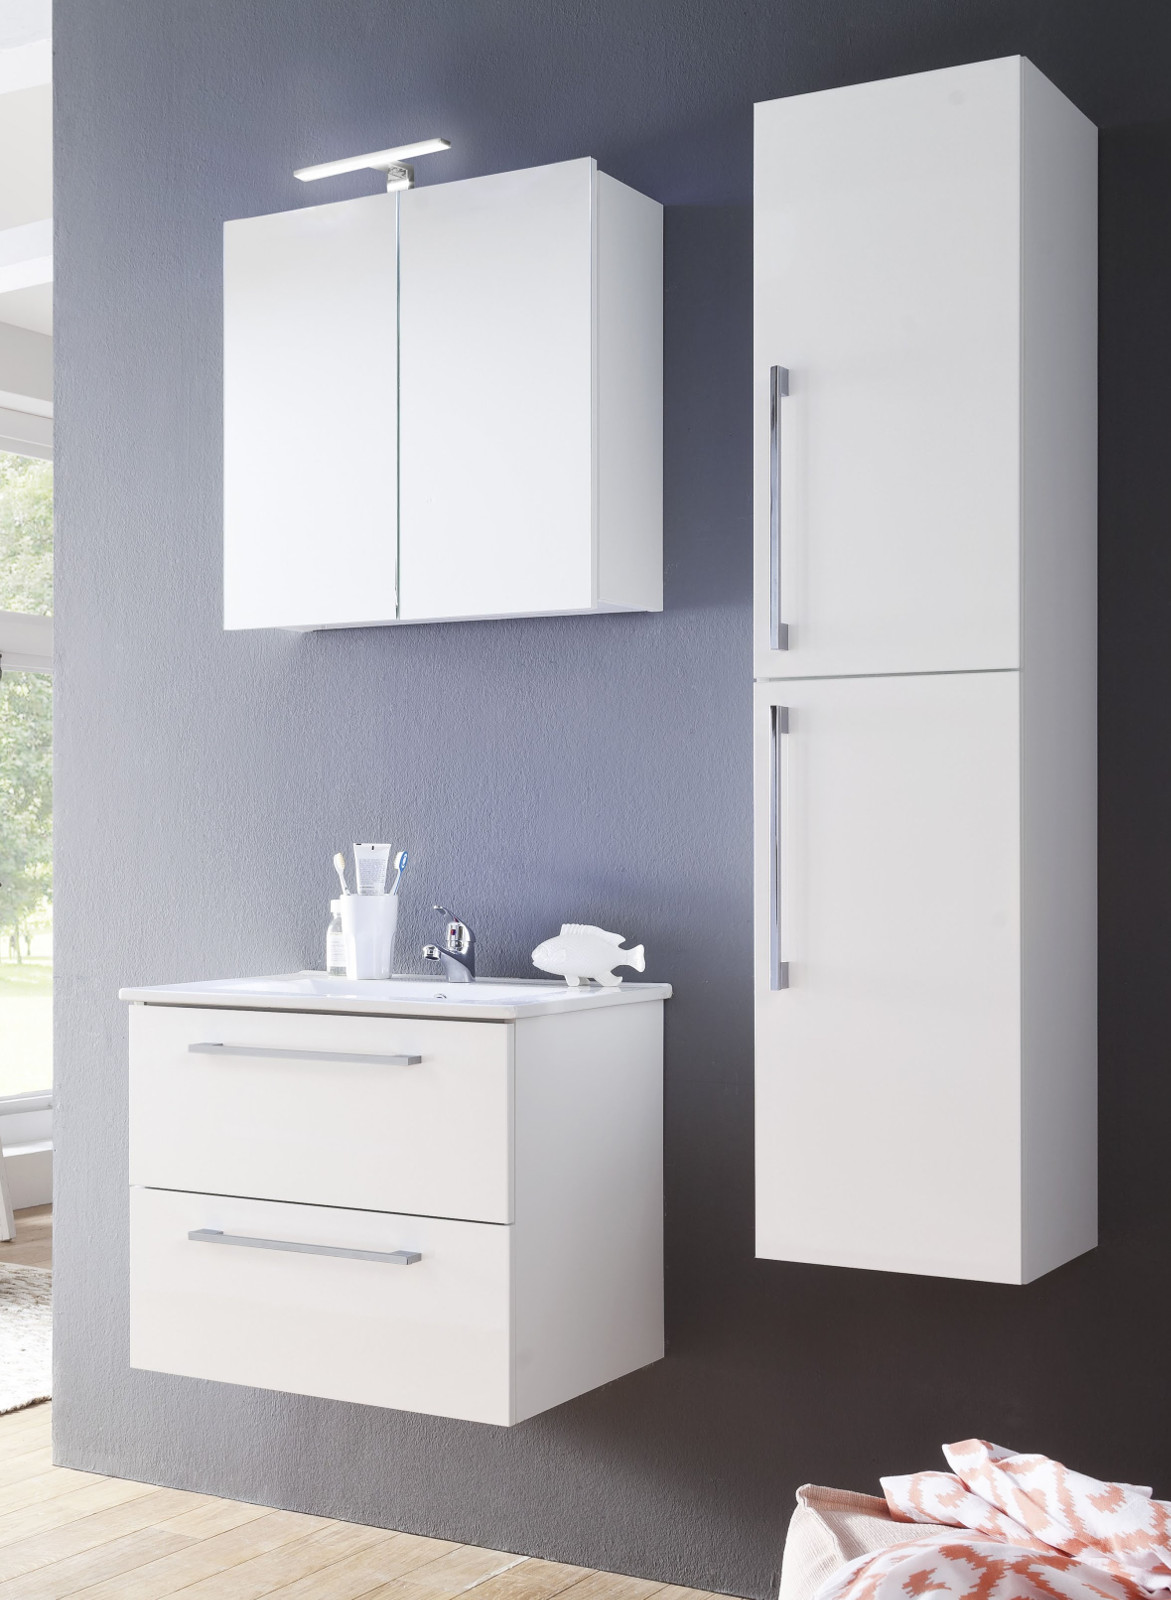 badm bel set intenso wei 2 teilig inkl waschbecken. Black Bedroom Furniture Sets. Home Design Ideas